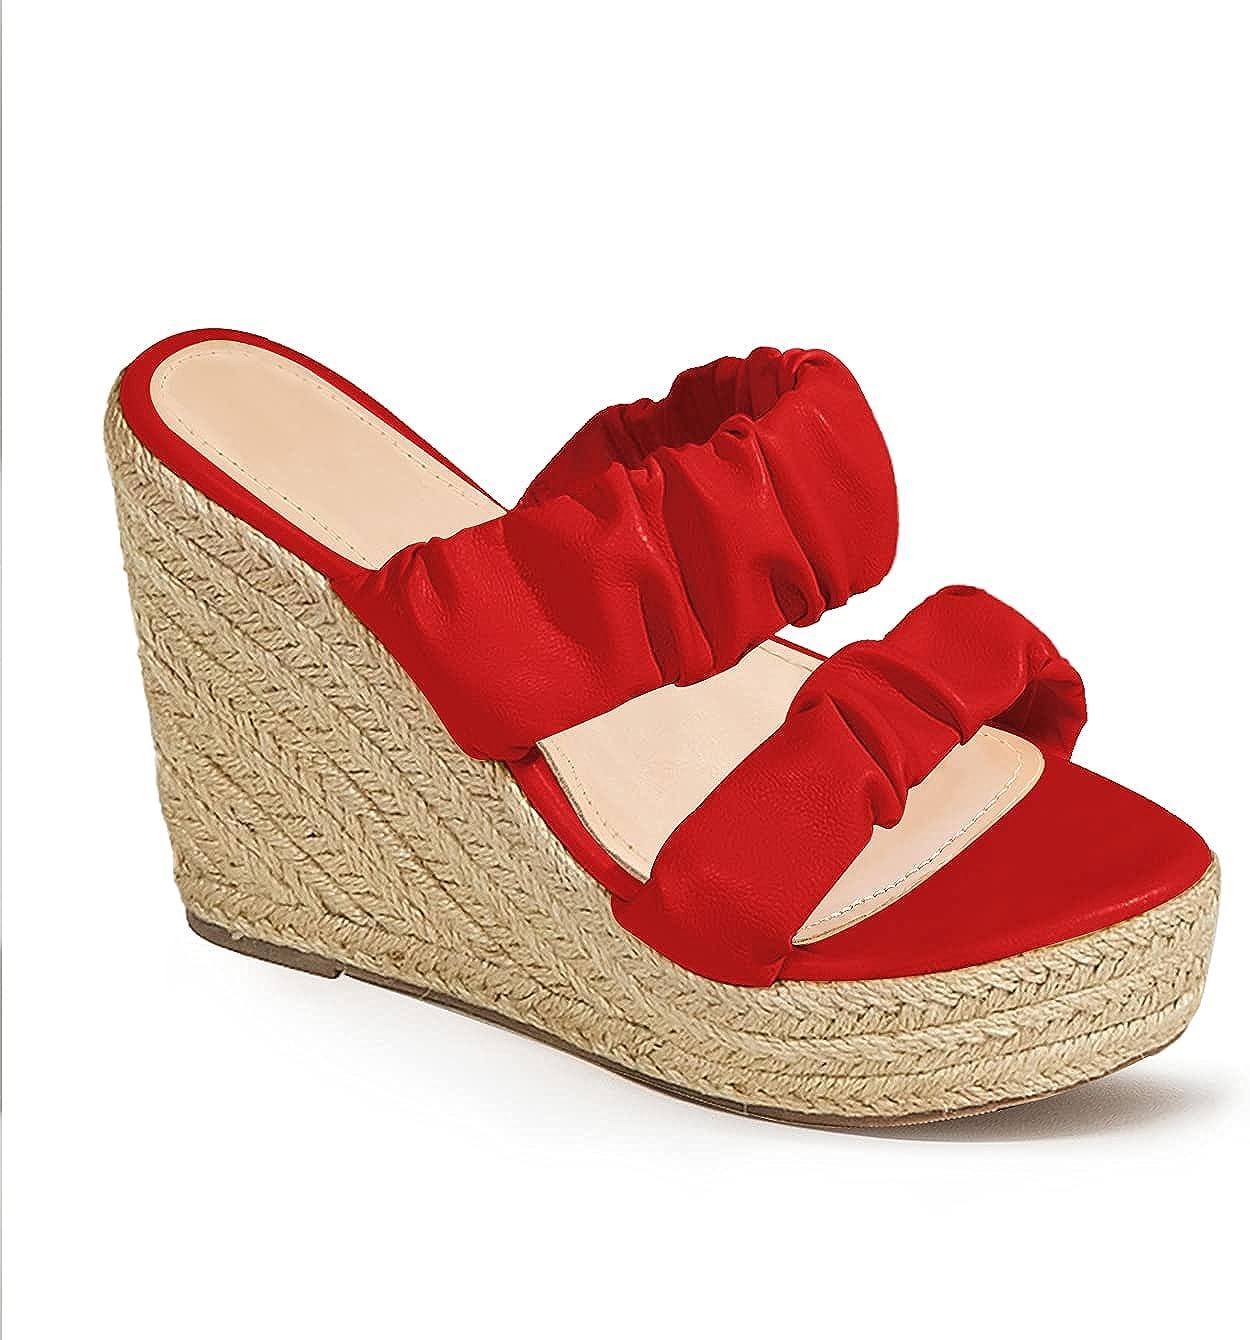 Womens Ruffled Wedge Sandals Espadrille Platform Strappy Slip On Open Toe Slides